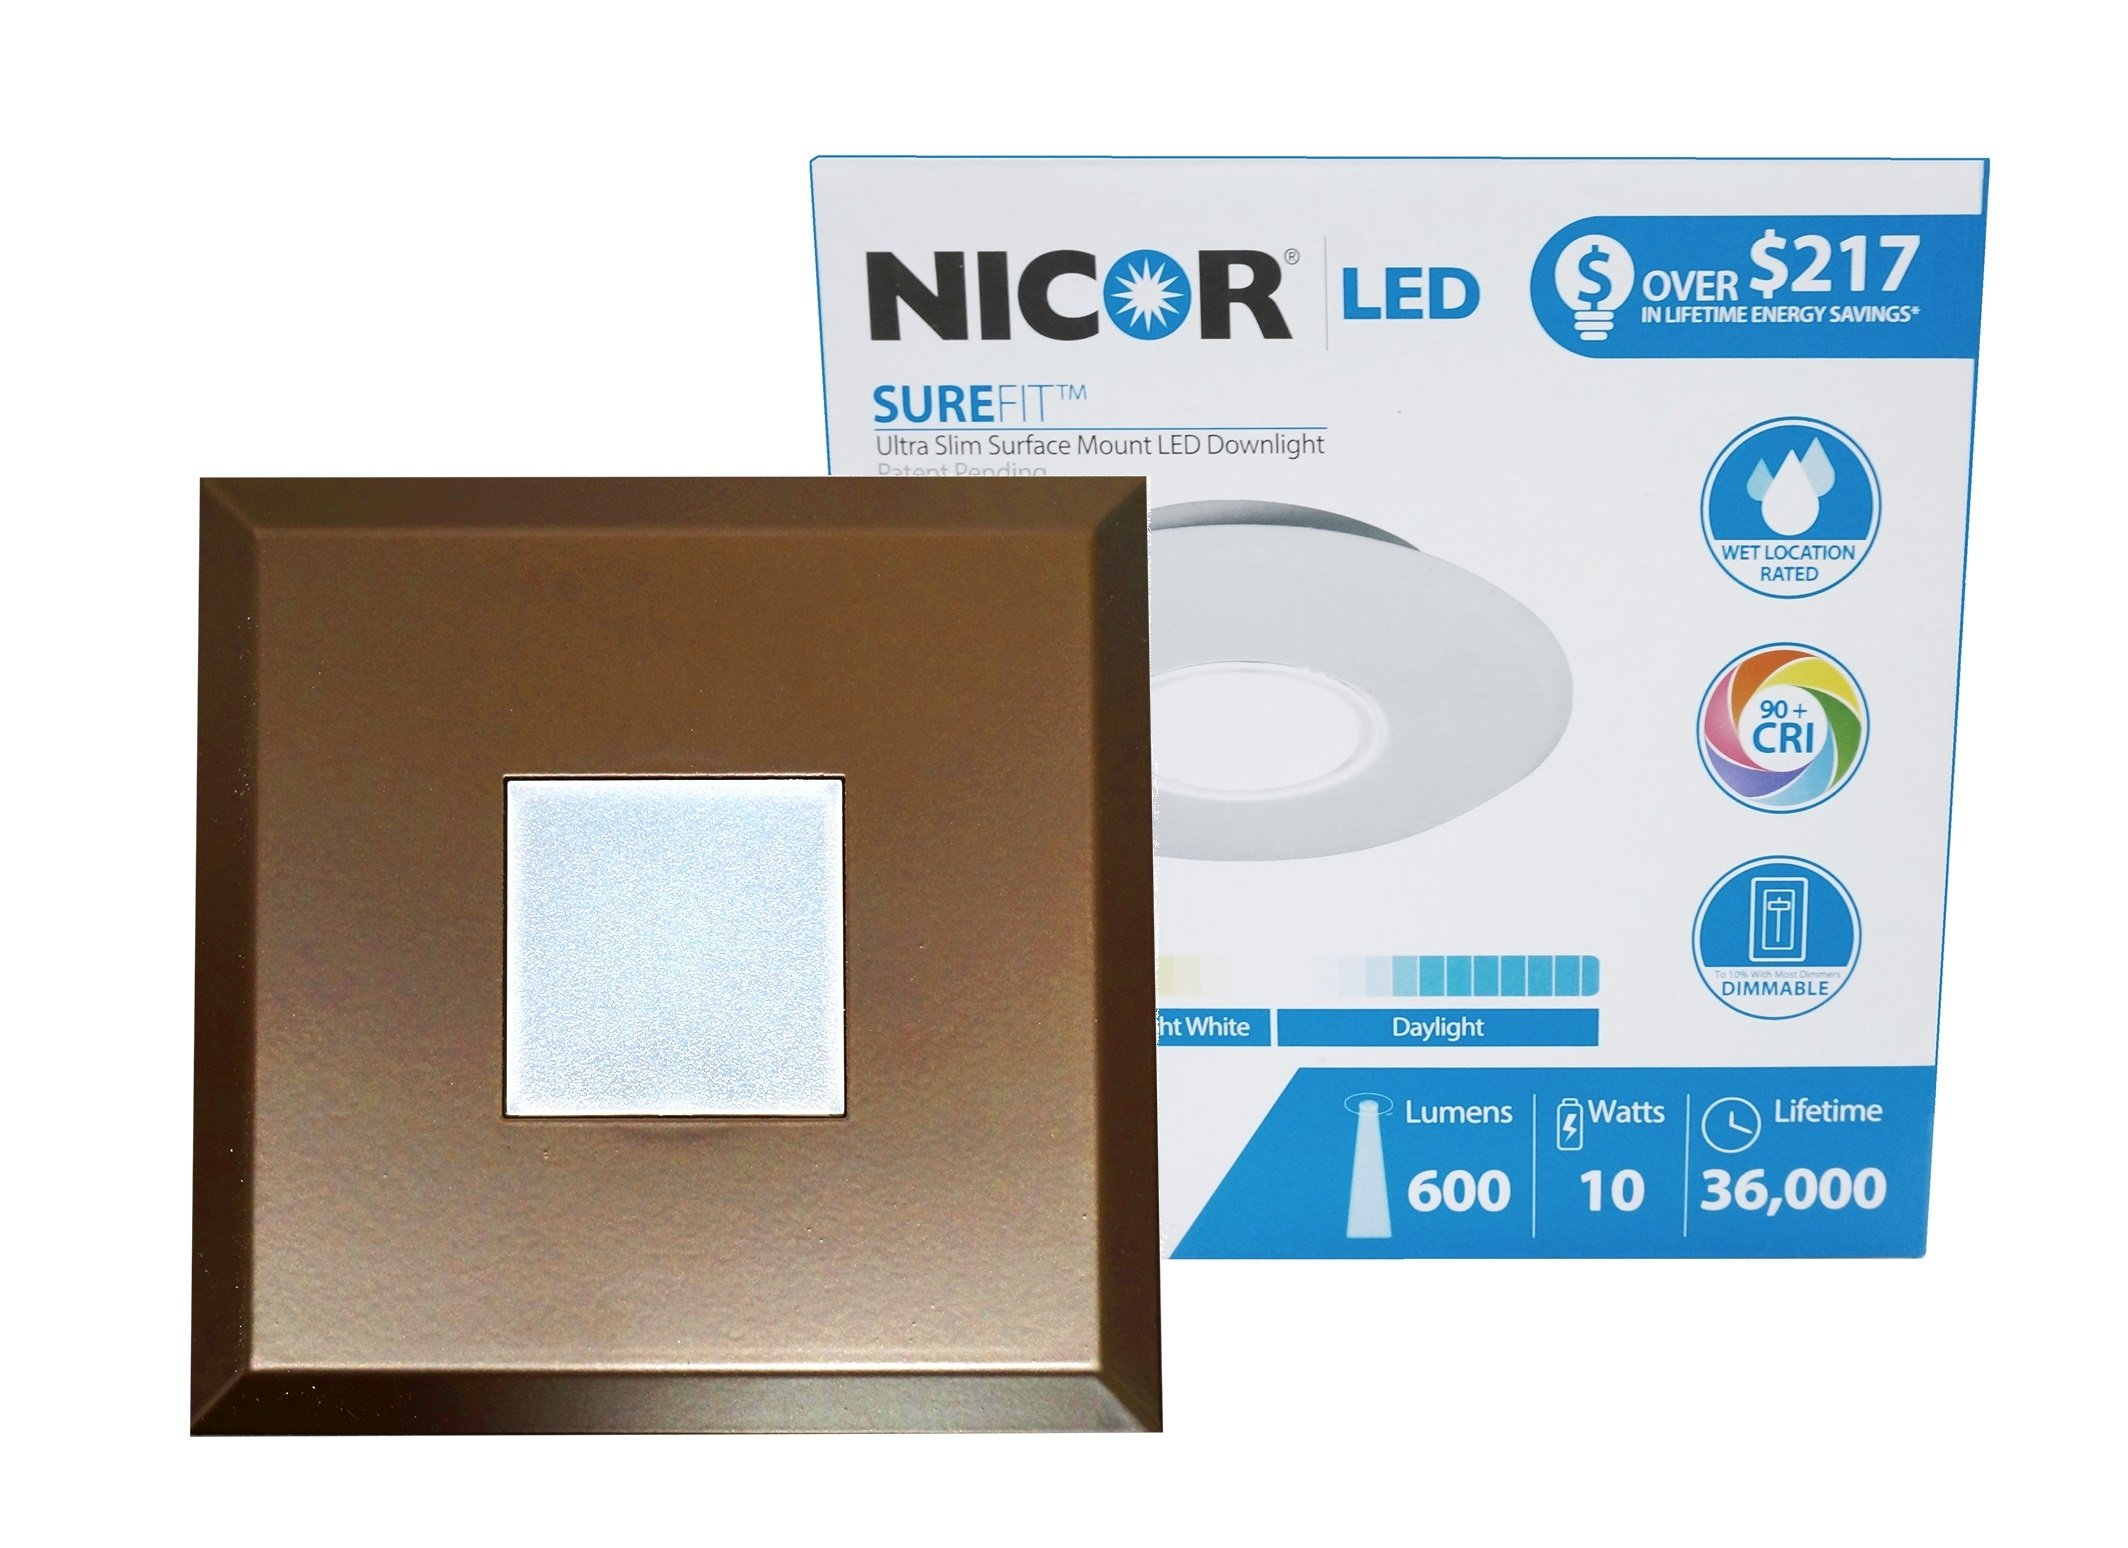 NICOR Lighting SureFit 5.25-inch Square Ultra Slim 2700K LED Junction Box Retrofit Downlight Kit, Oil-Rubbed Bronze (DLF-10-120-2K-SQ-OB) by NICOR Lighting